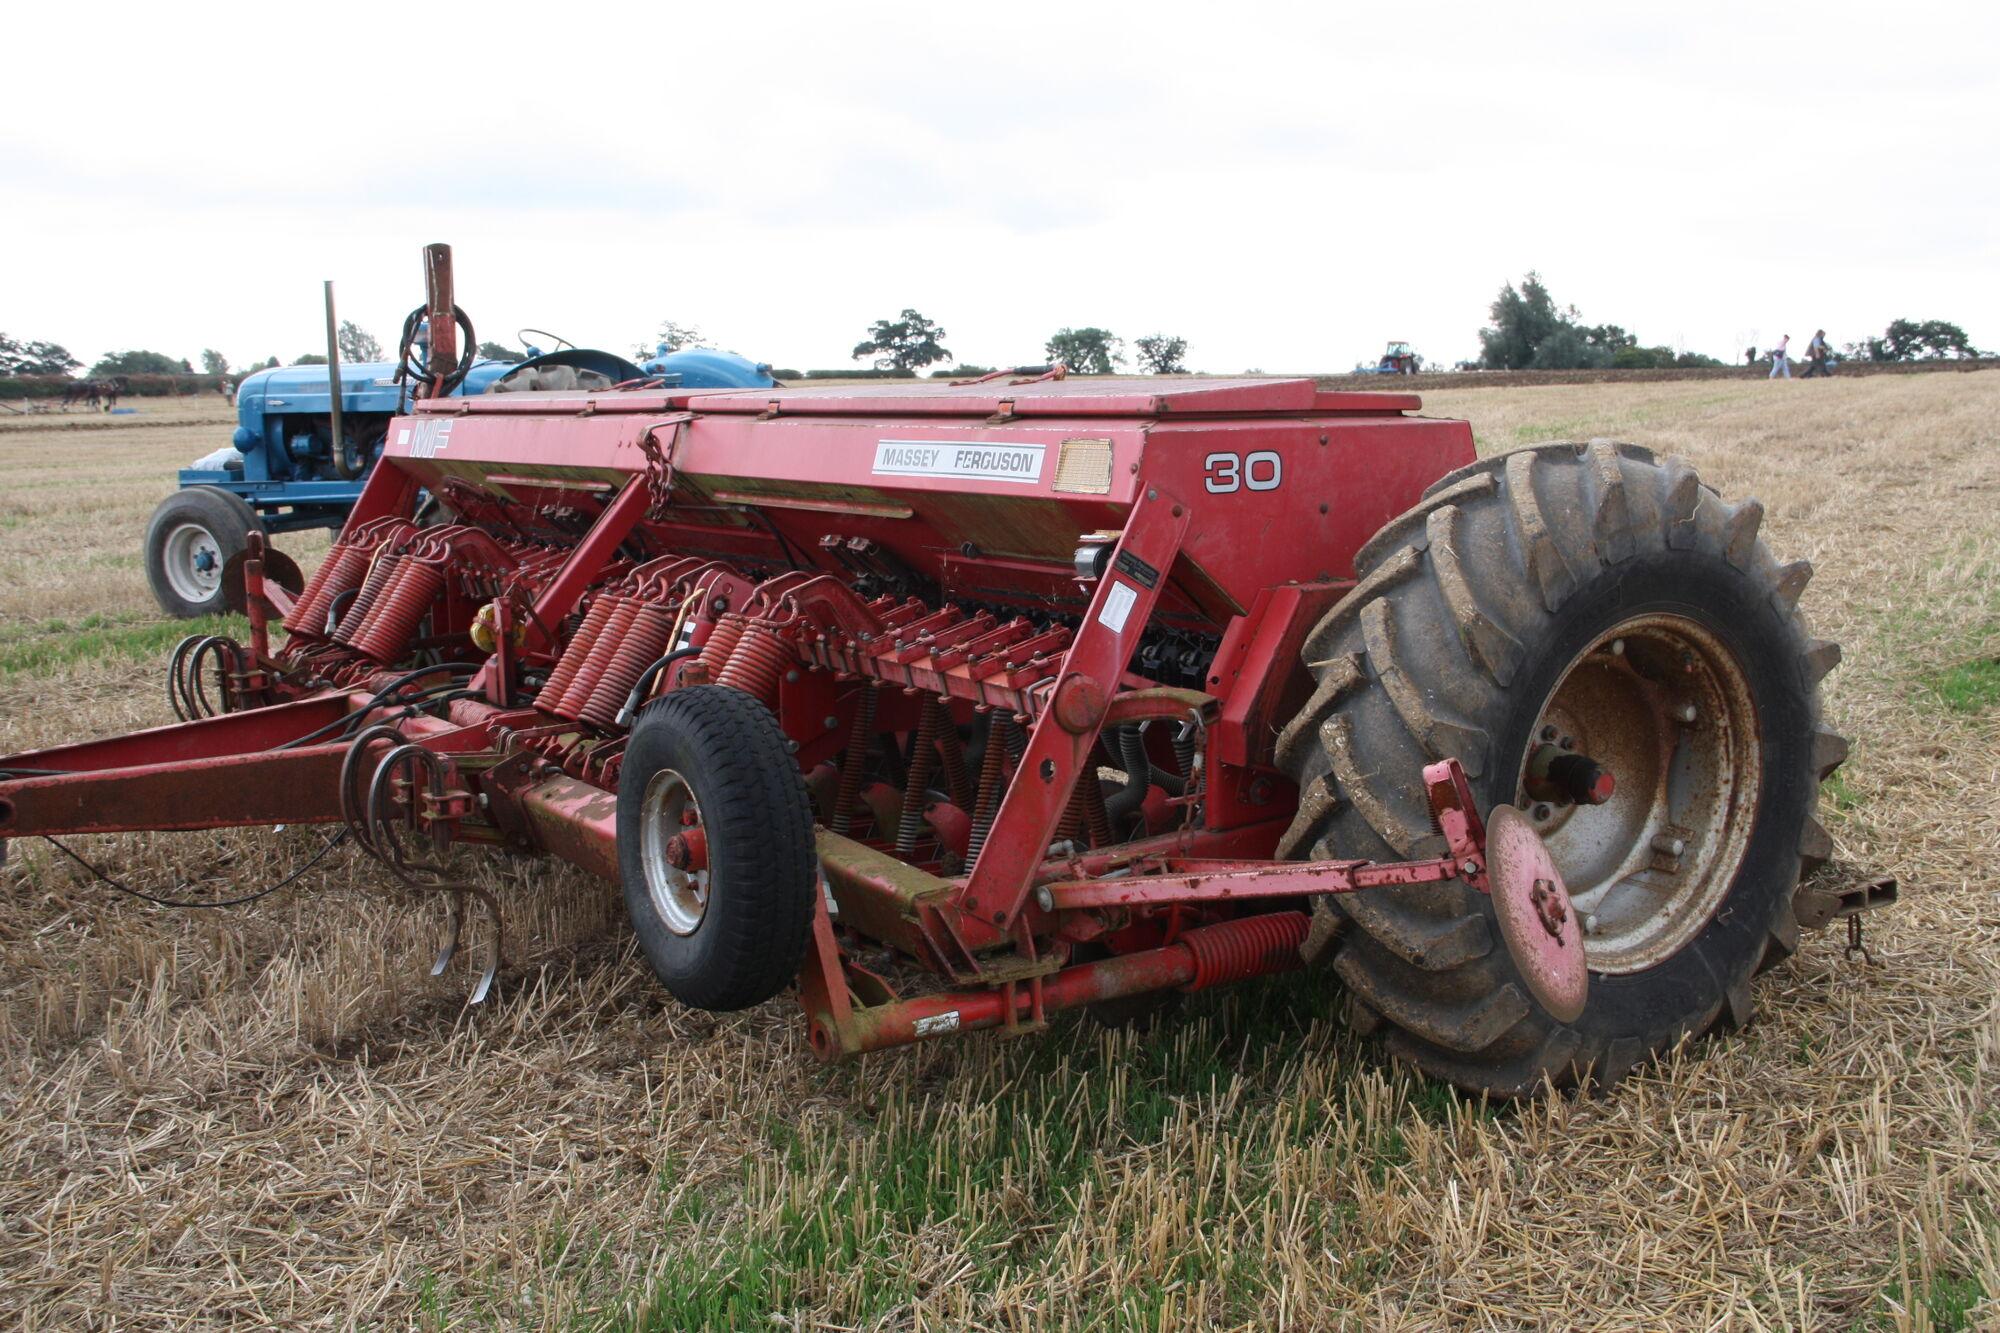 Image - Massey Ferguson MF 30 Seed drill at Maldon WD 11 - IMG 5049.JPG |  Tractor & Construction Plant Wiki | FANDOM powered by Wikia